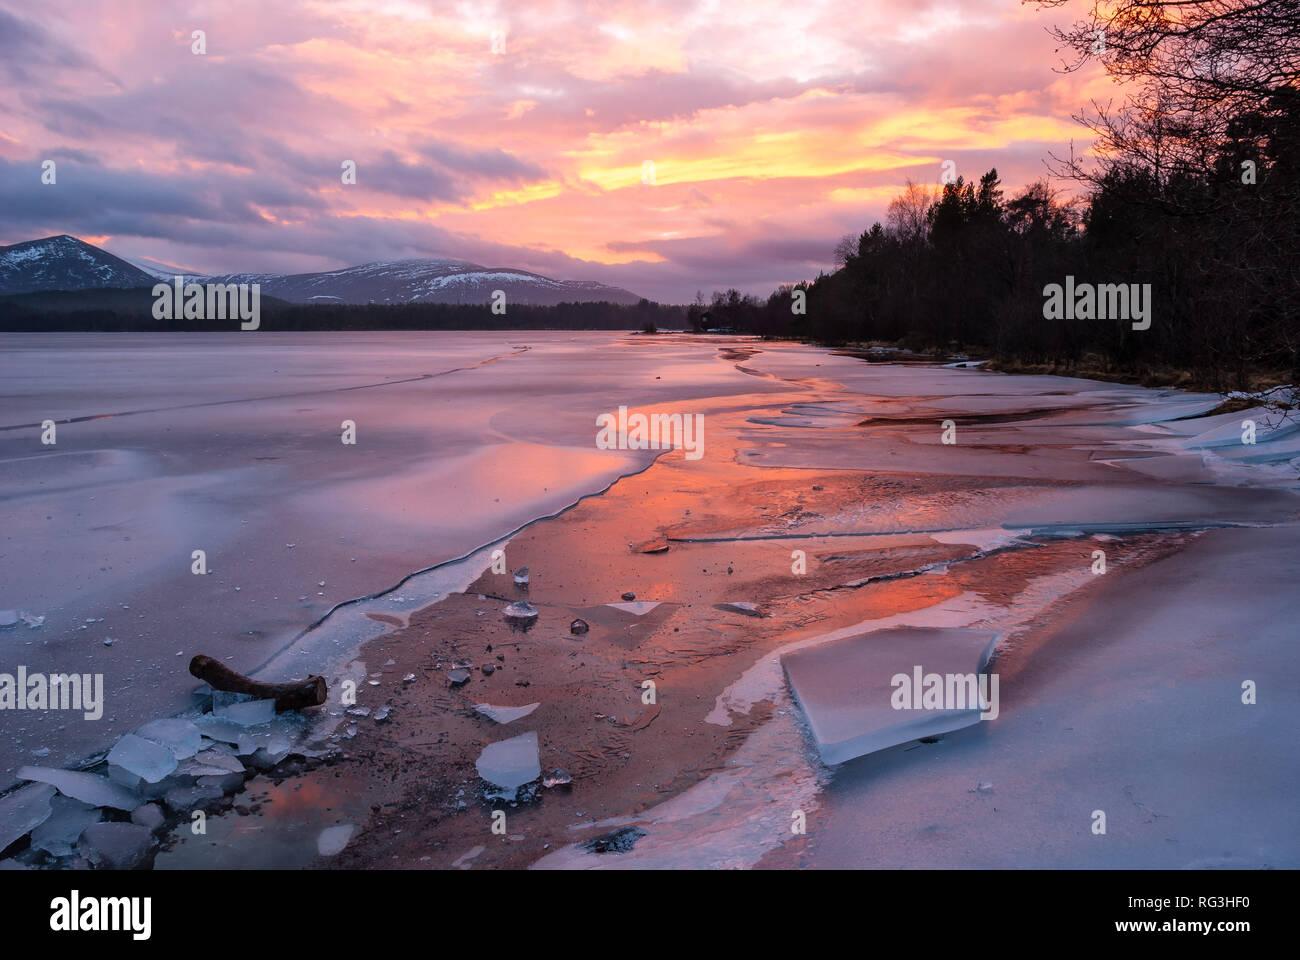 Loch Morlich, Aviemore, Badenoch, Scotland, United Kingdom Stock Photo